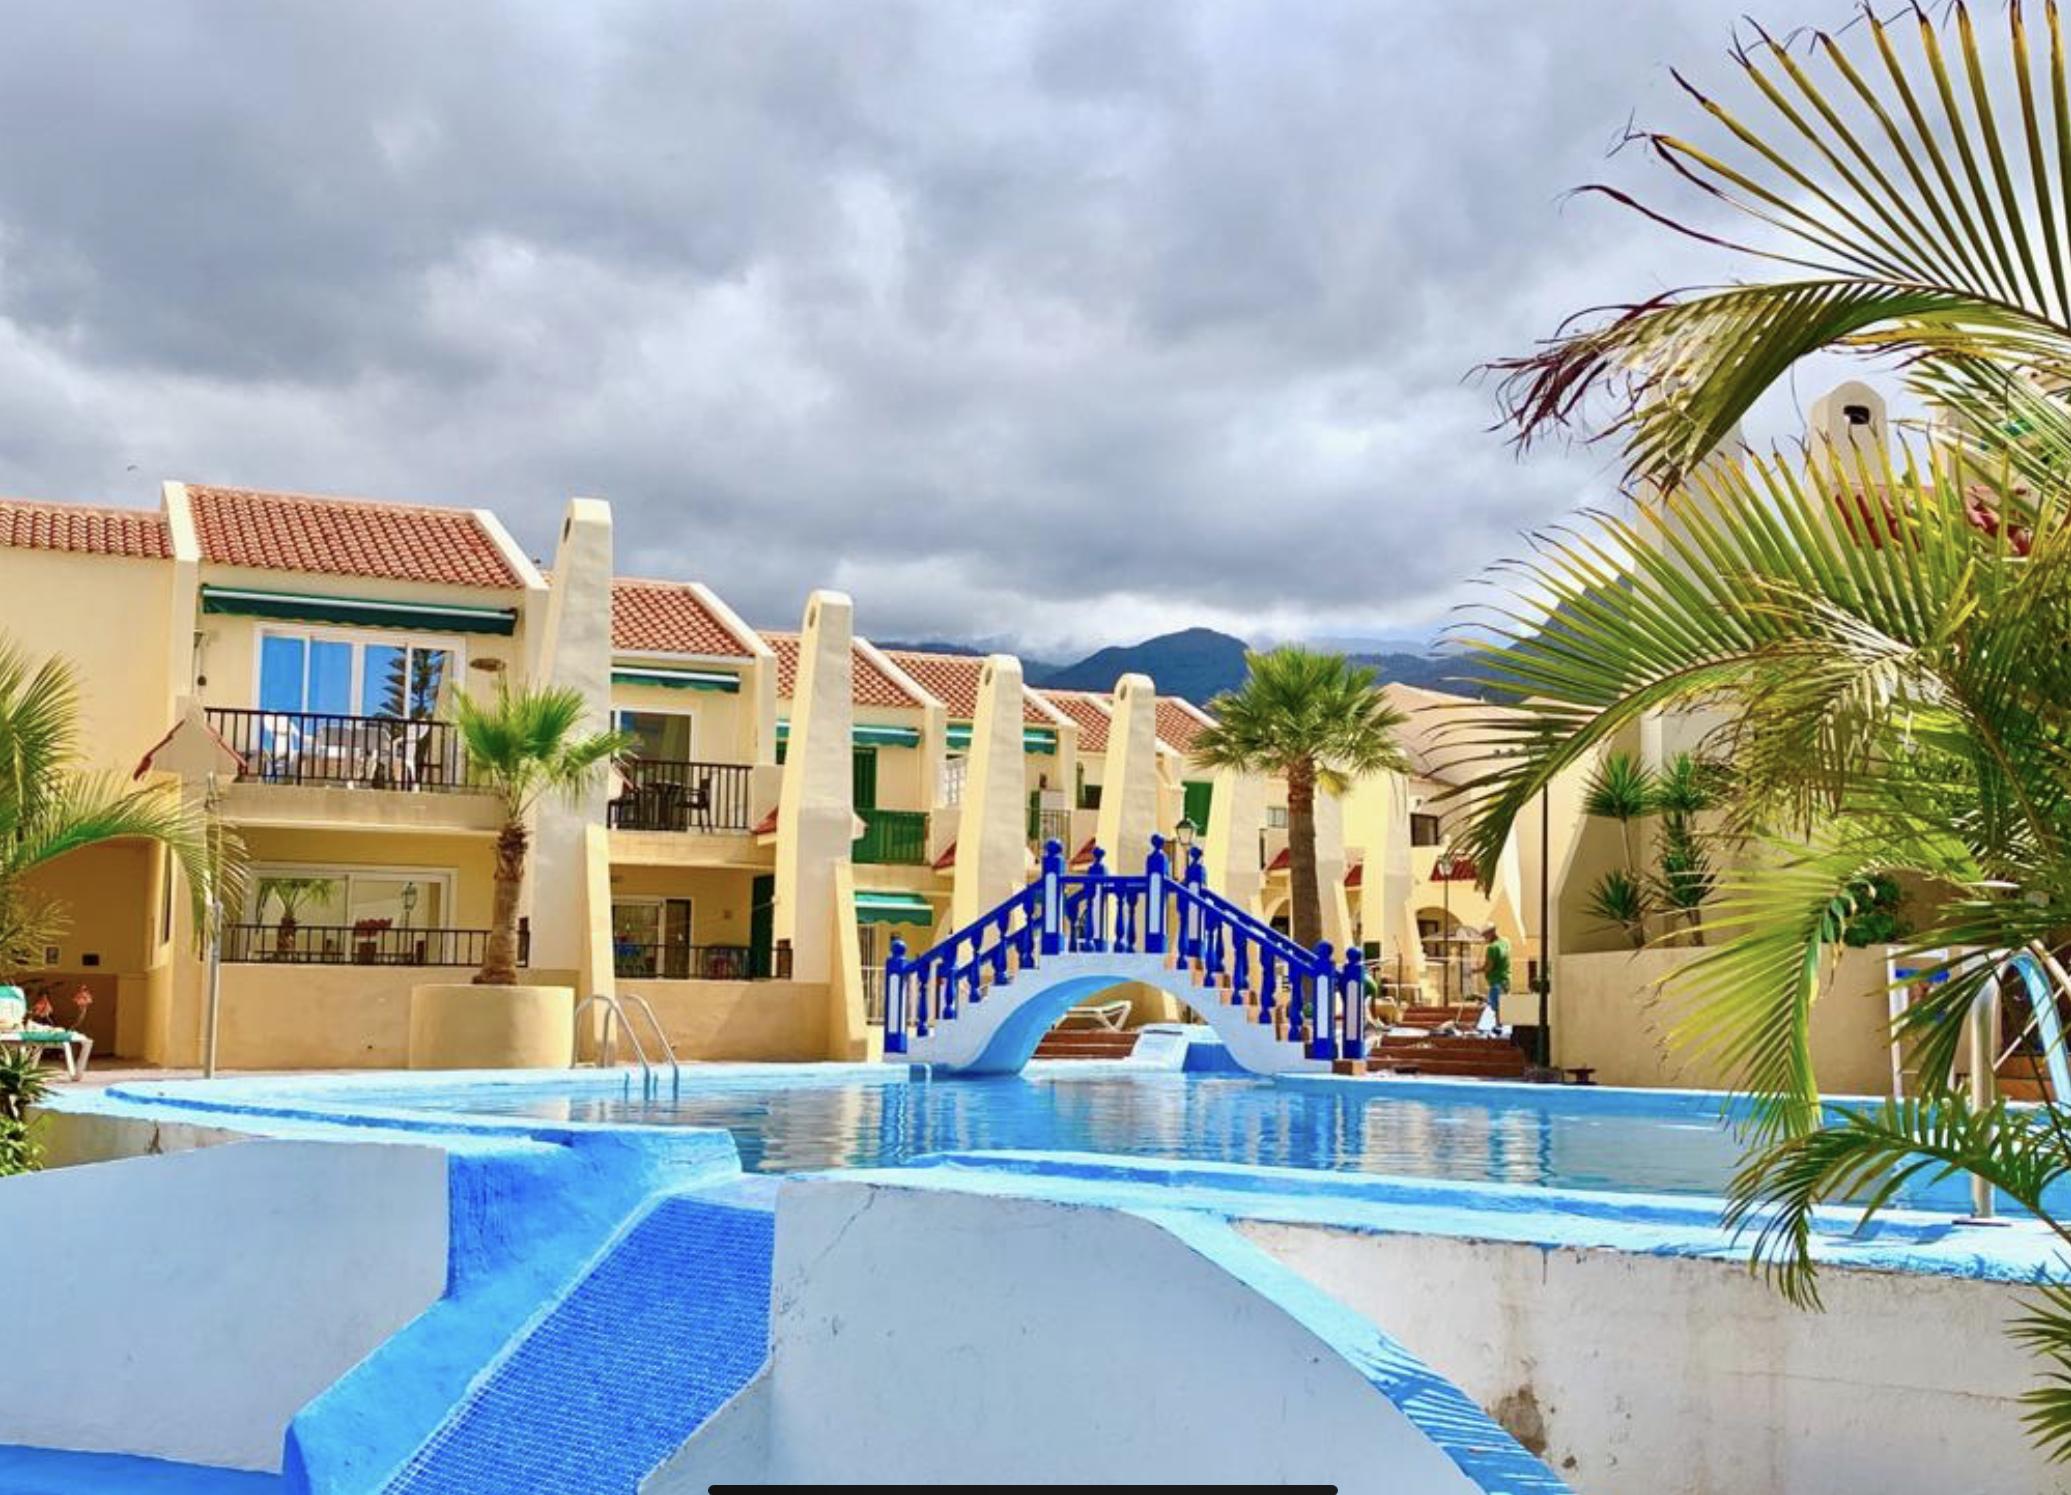 Letting Property Home M0970D0V, Tenerife, South Tenerife, Fañabe Beach